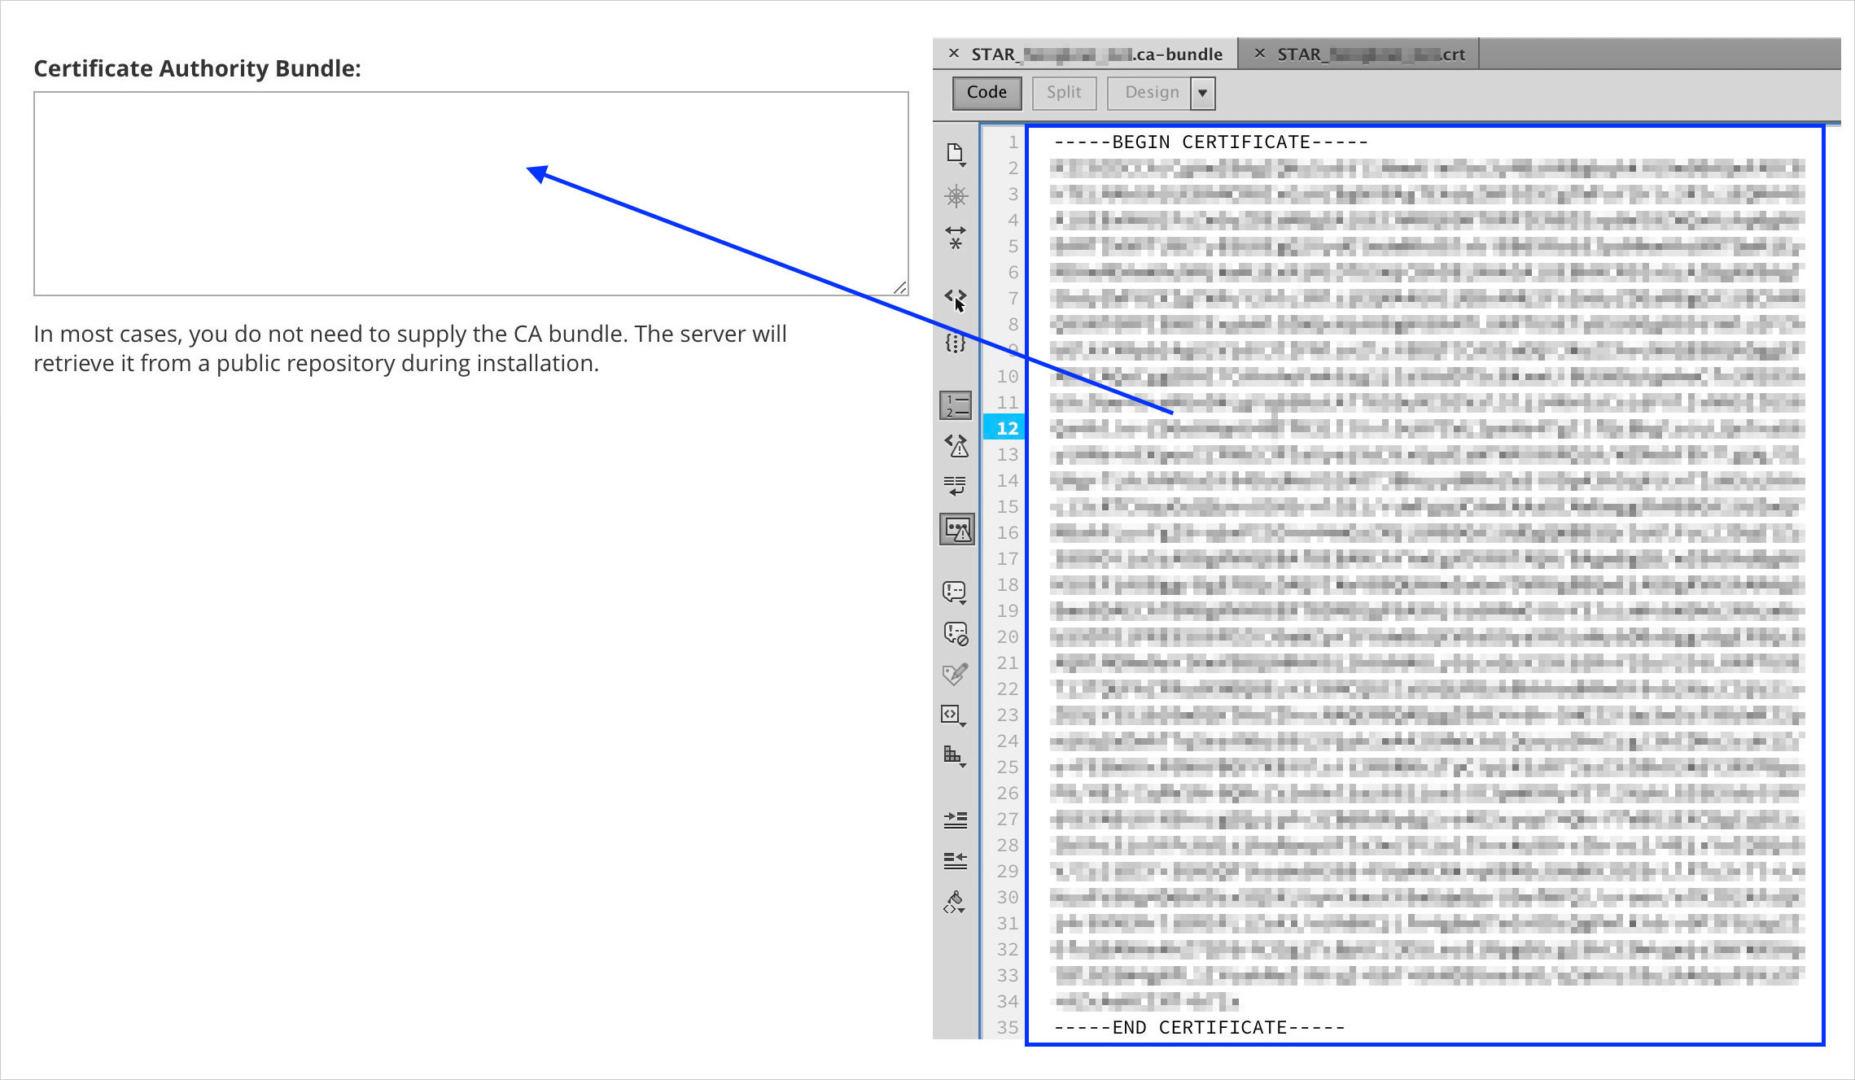 certificate authority bundle